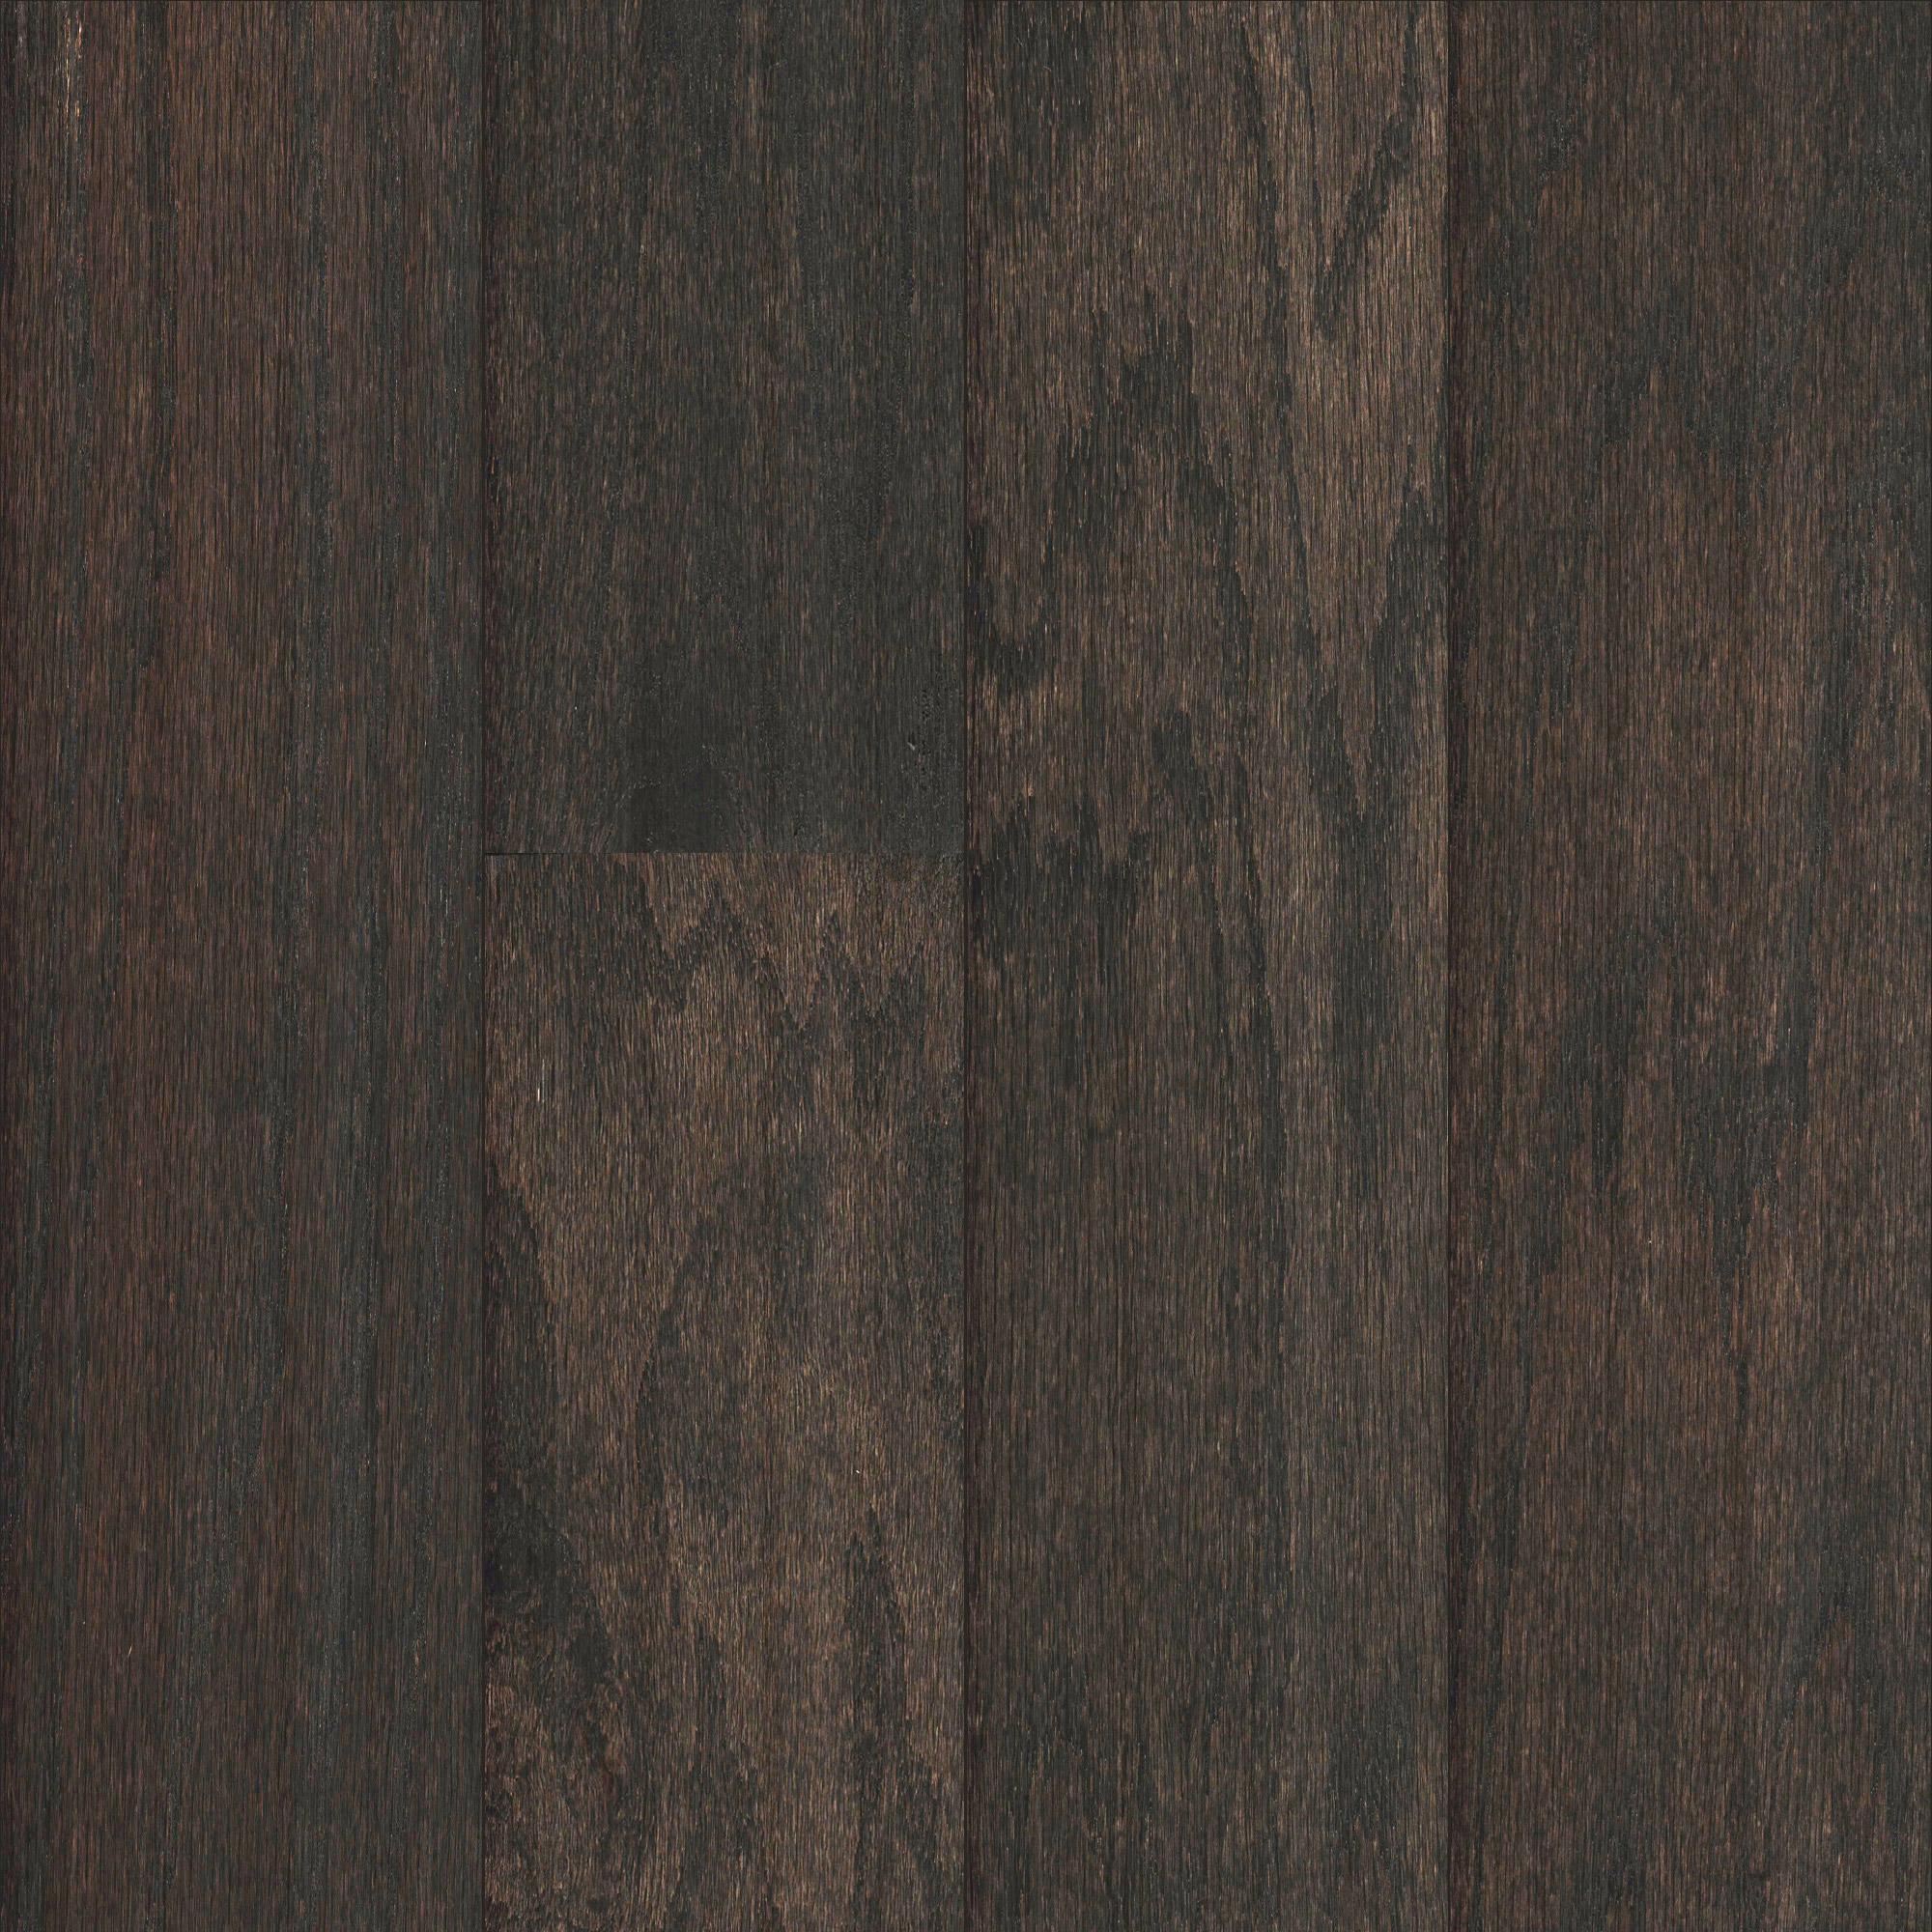 2 1 2 oak hardwood flooring of mullican newtown plank oak granite 1 2 thick 5 wide engineered intended for mullican newtown plank oak granite 1 2 thick 5 wide engineered hardwood flooring